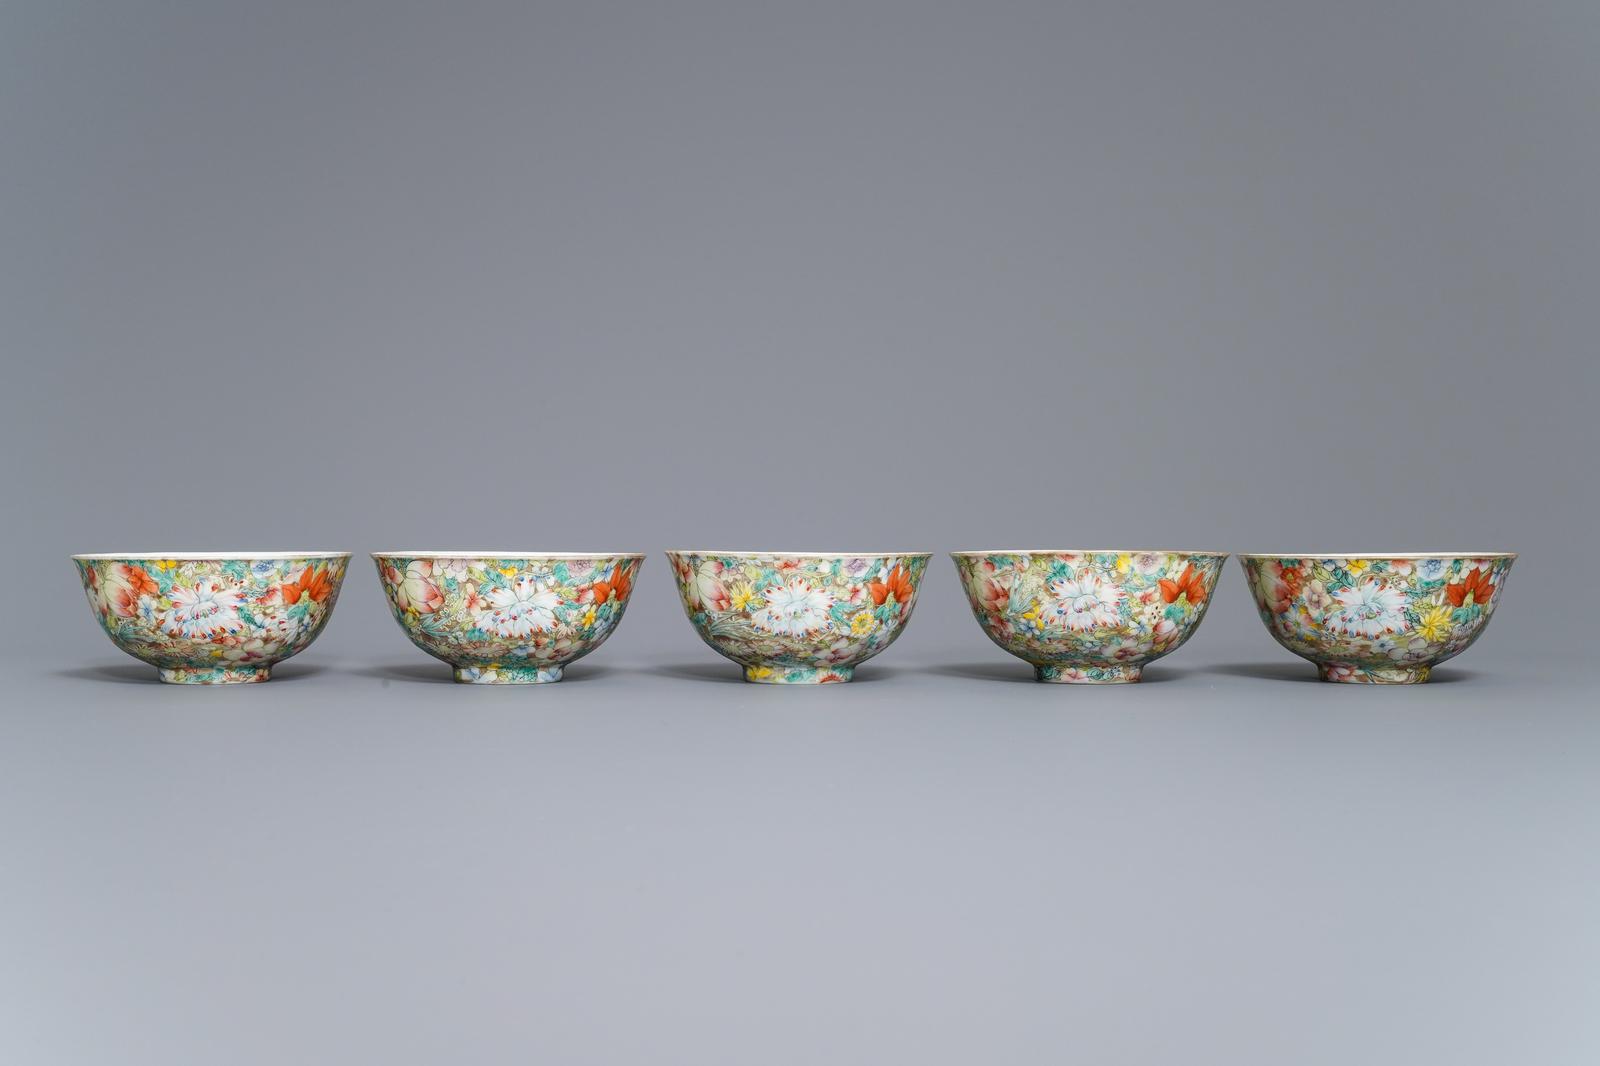 Lot 2 - Five Chinese famille rose 'millefleurs' bowls, Qianlong mark, Republic, 20th C.